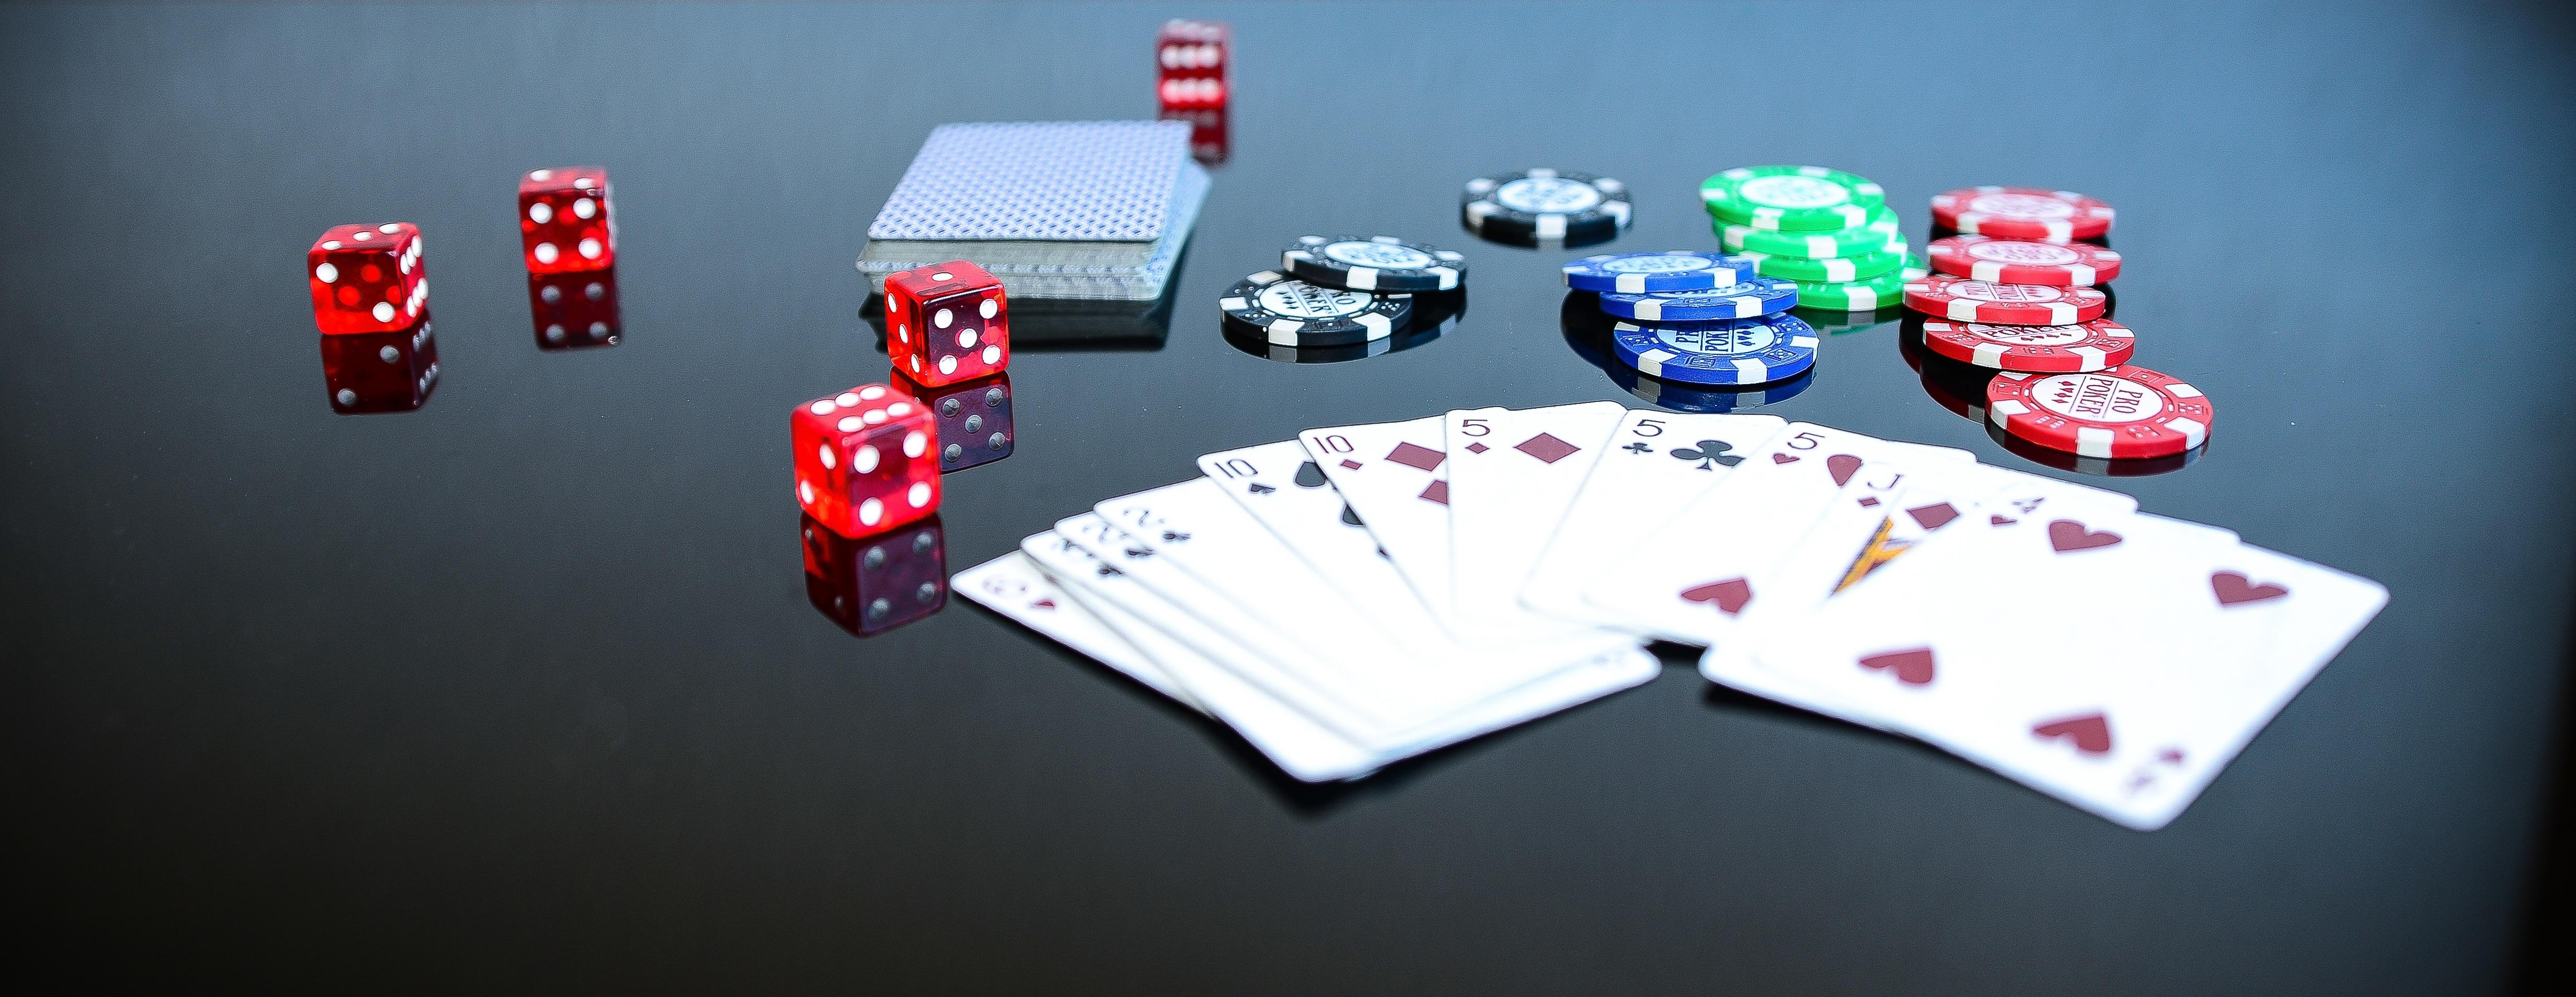 slots, online casino, gambling